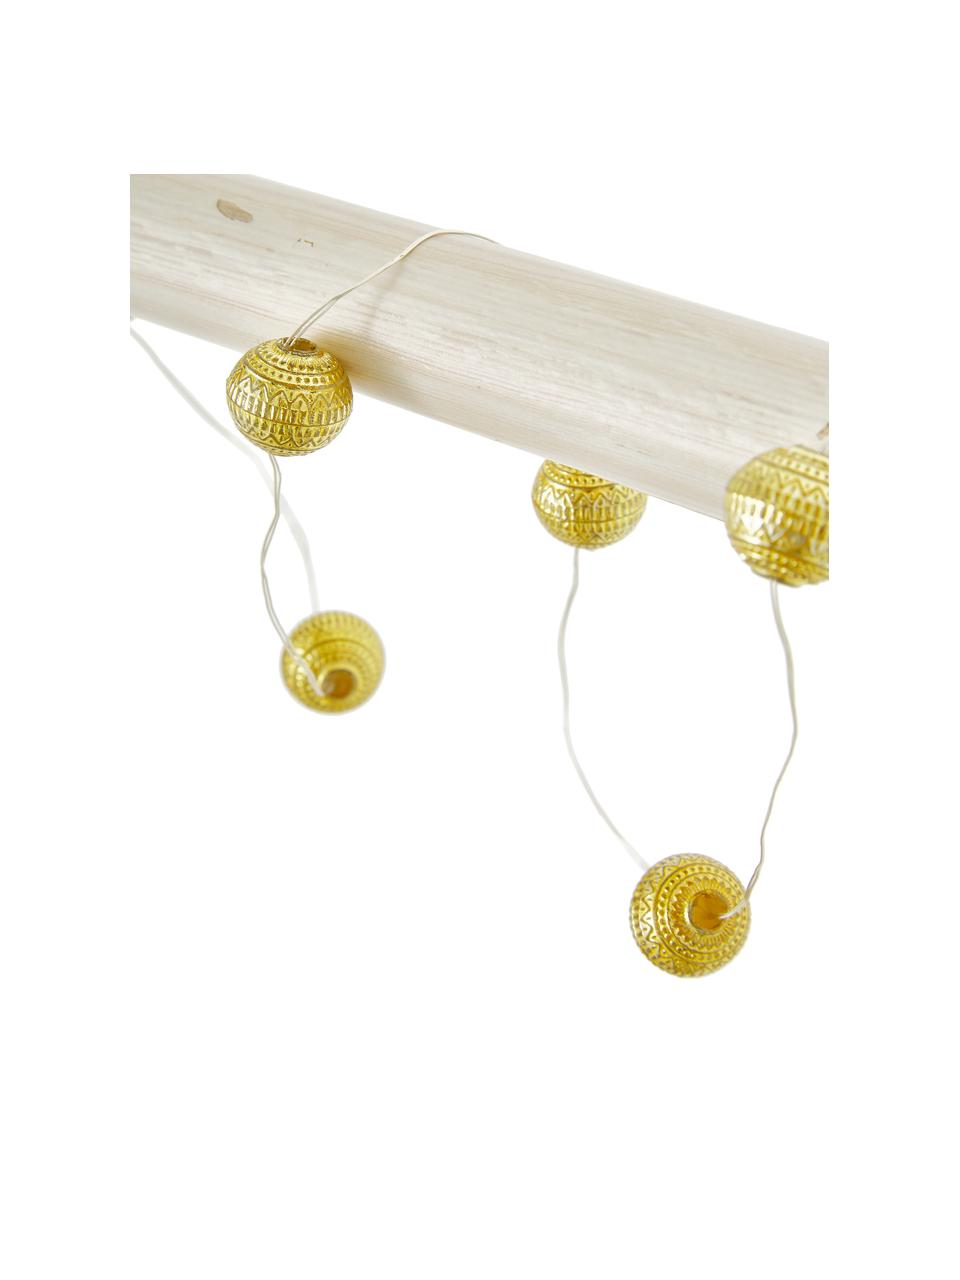 LED-Lichterkette Beads, 120 cm, 10 Lampions, Lampions: Acryl, Goldfarben, L 120 cm